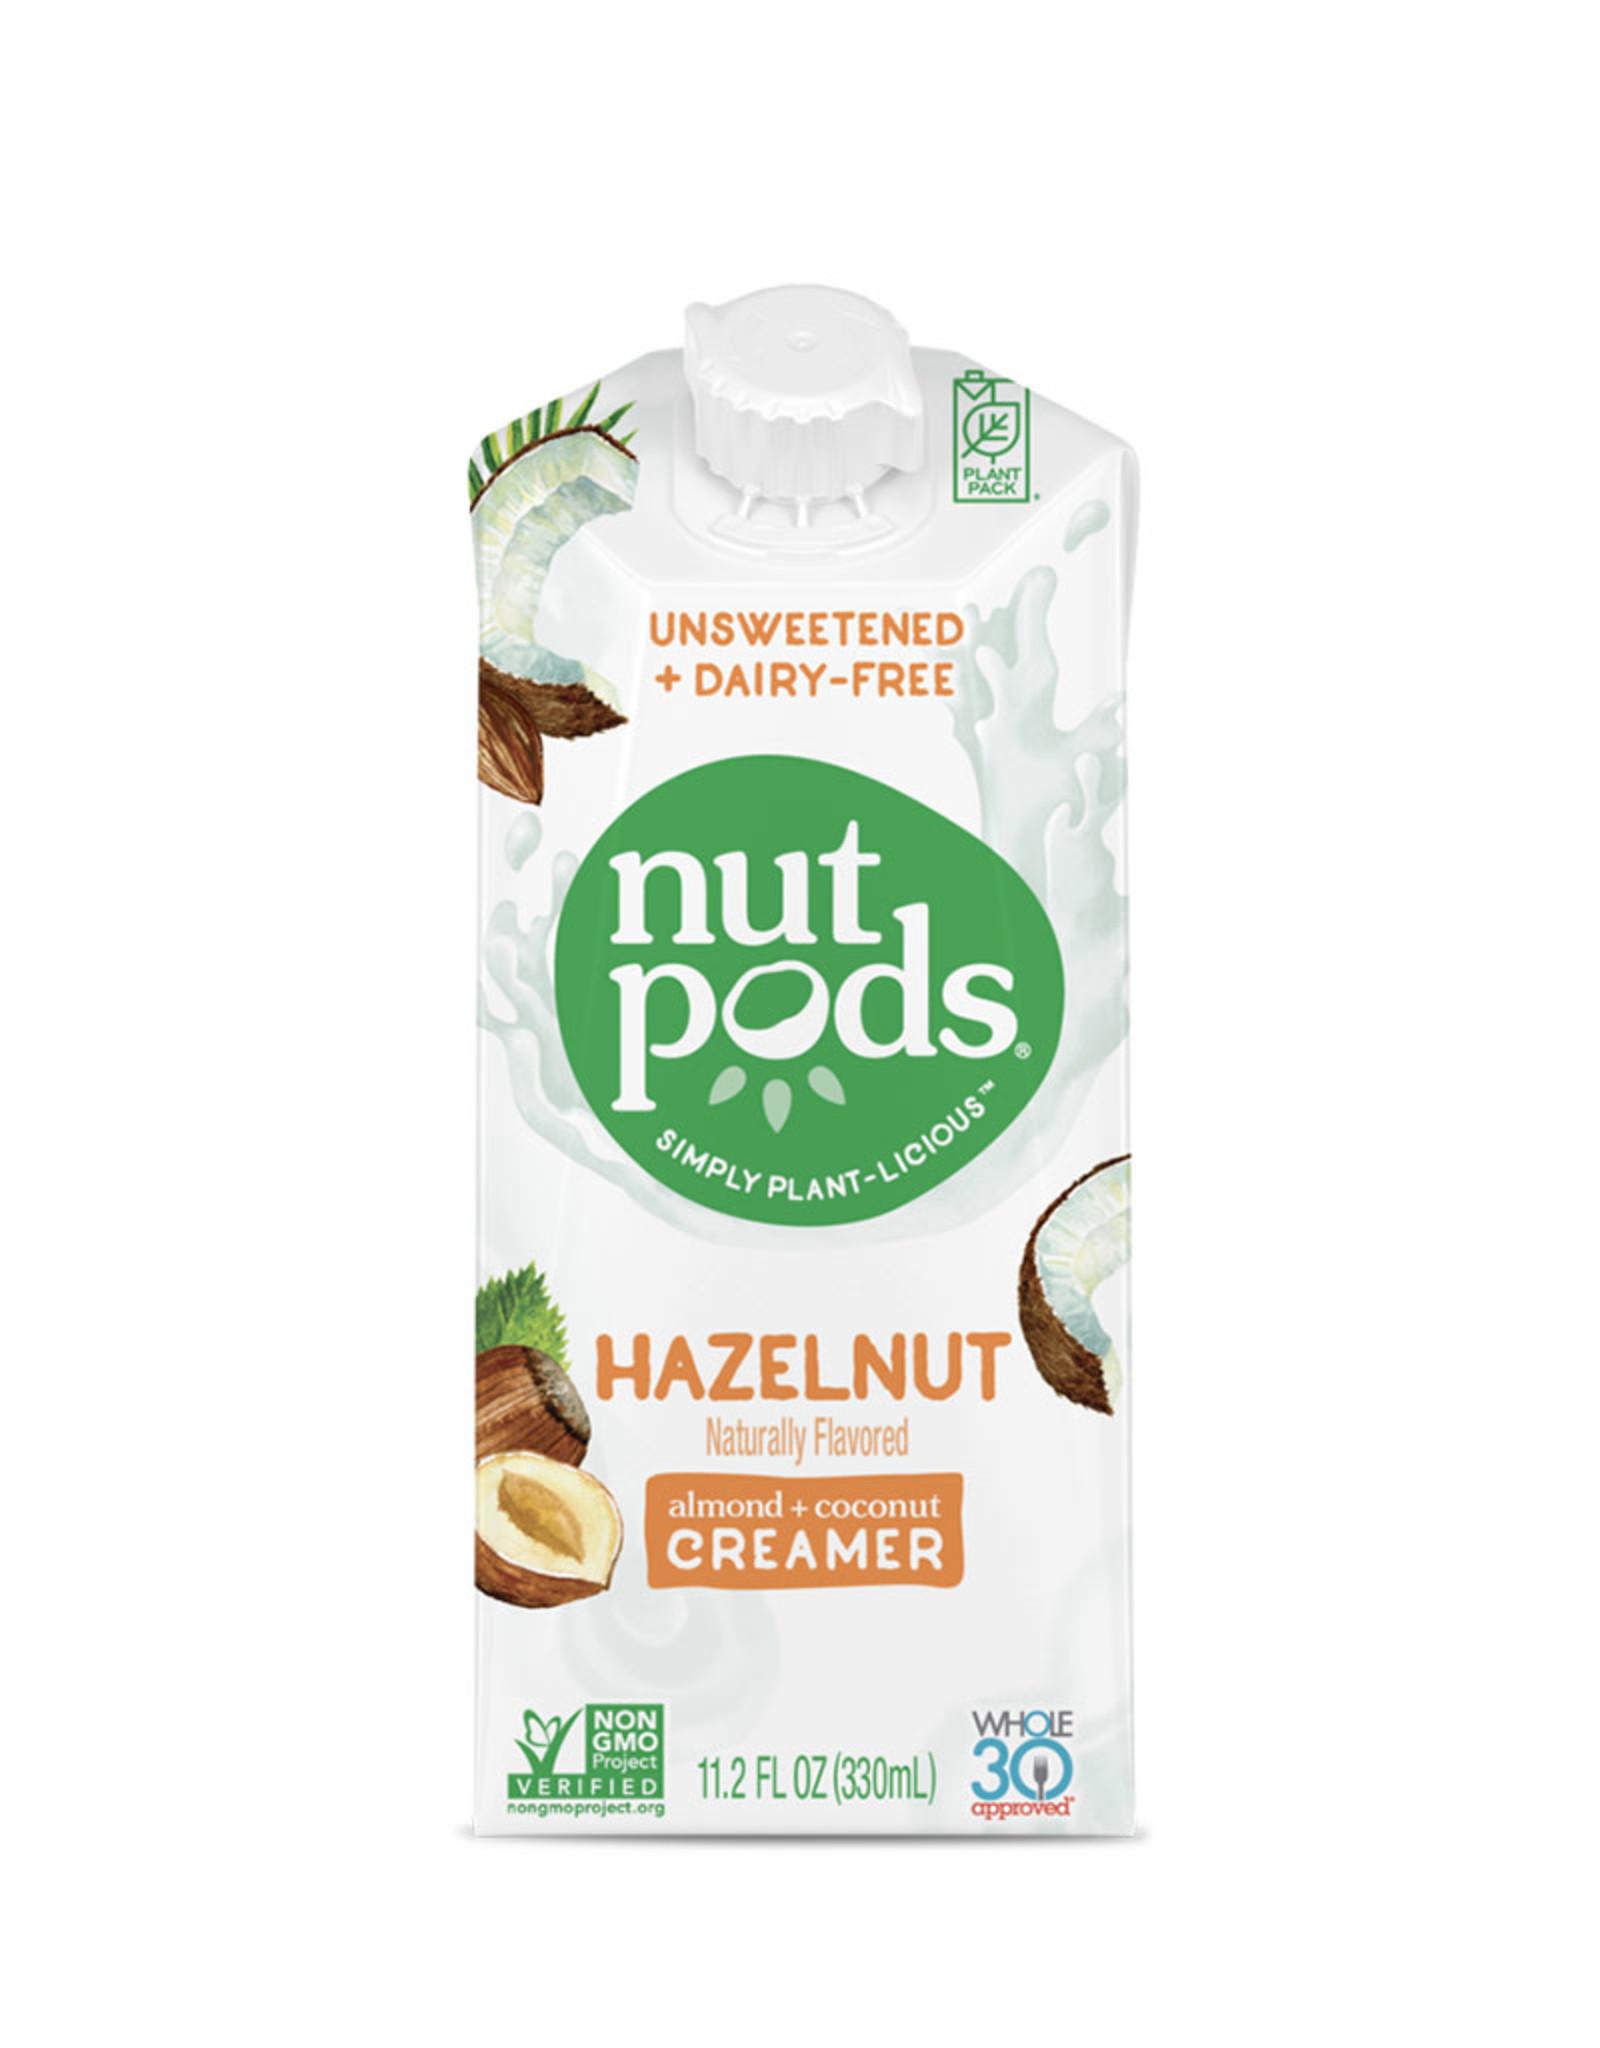 Nutpods Nutpods - Unsweetened Dairy-Free Creamer, Hazelnut (330ml)